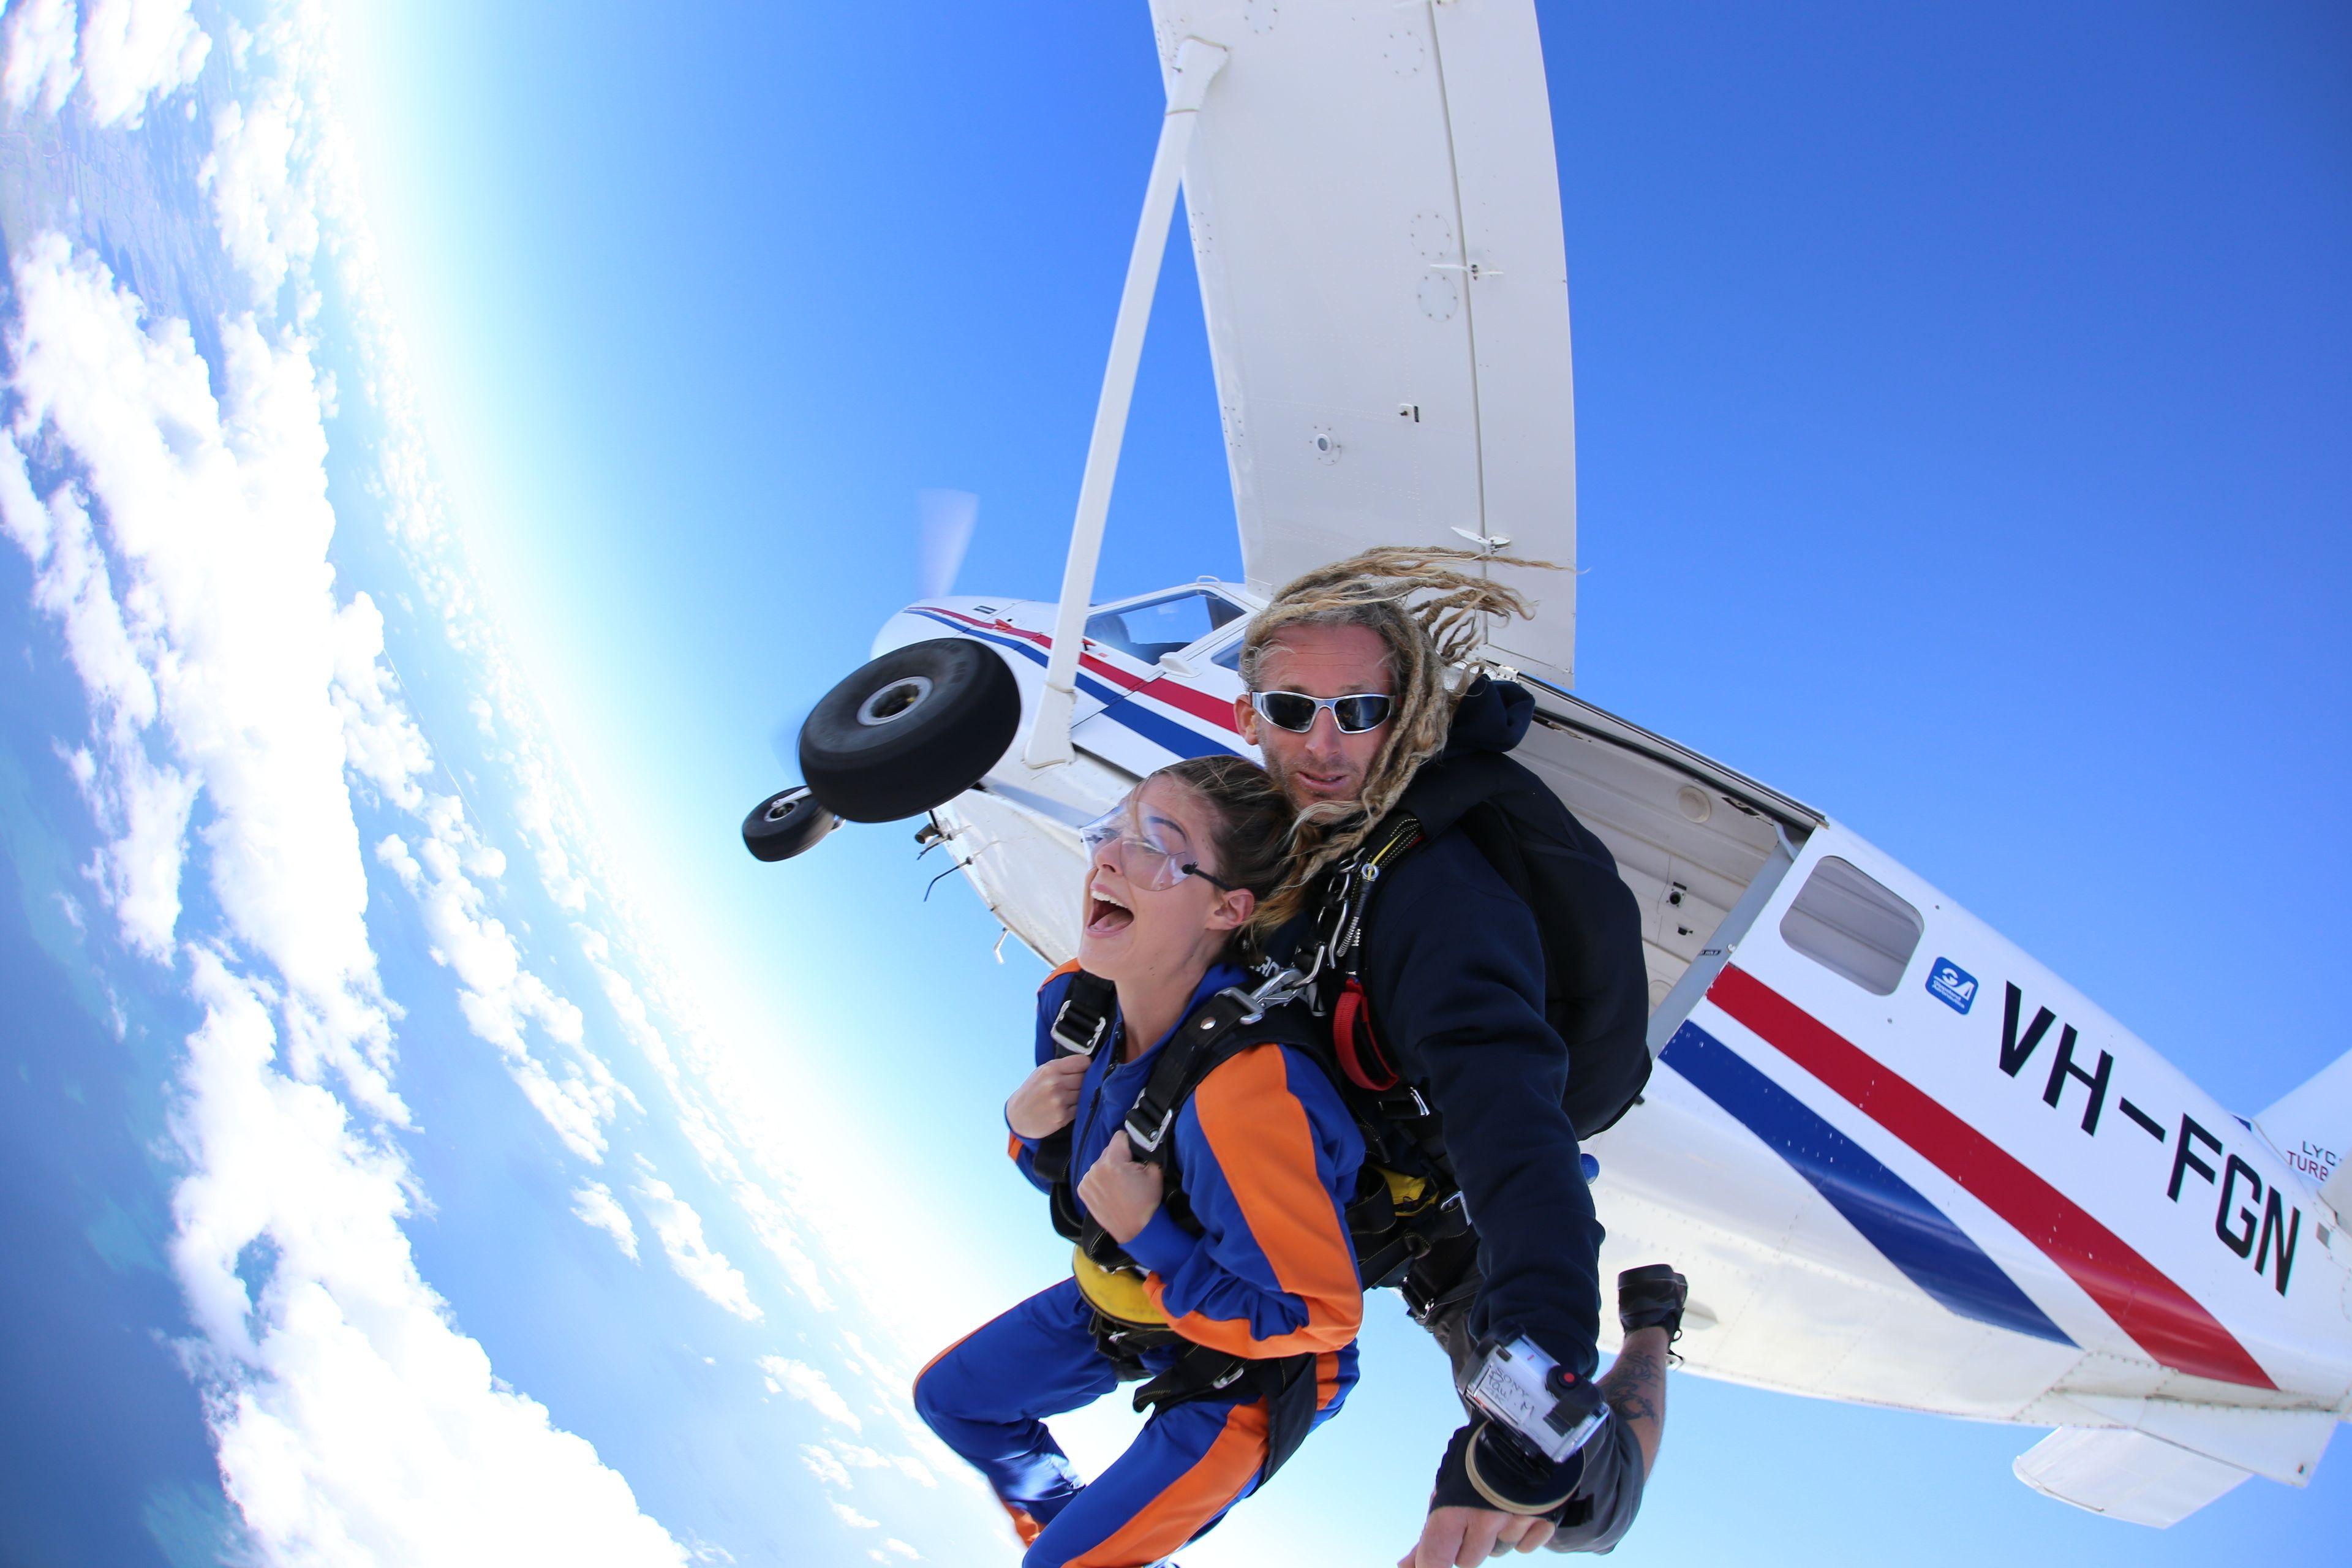 Tandem skydiving in Busselton